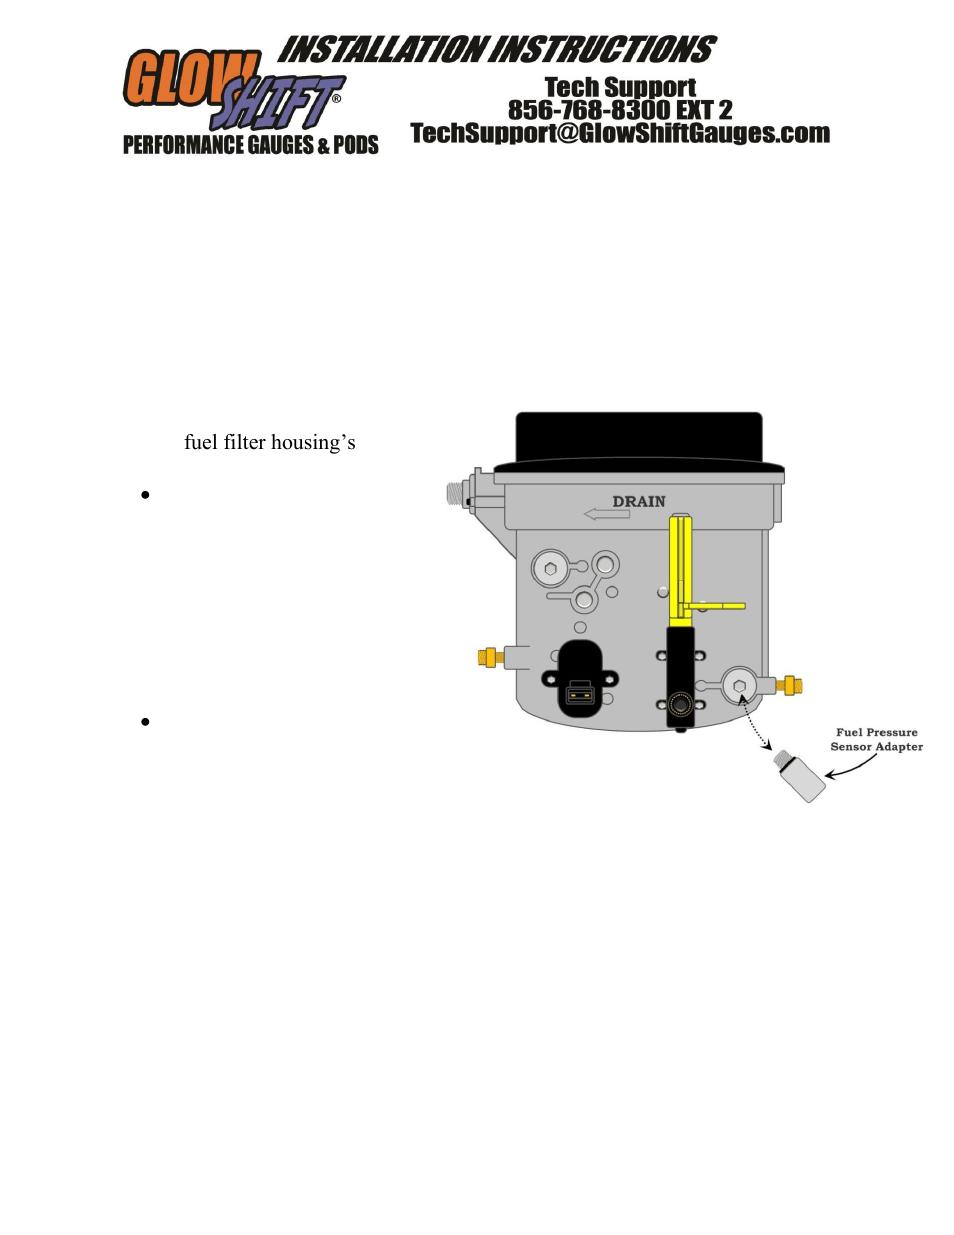 medium resolution of glowshift ford super duty 7 3 powerstroke fuel pressure sensor adapter user manual 1 page